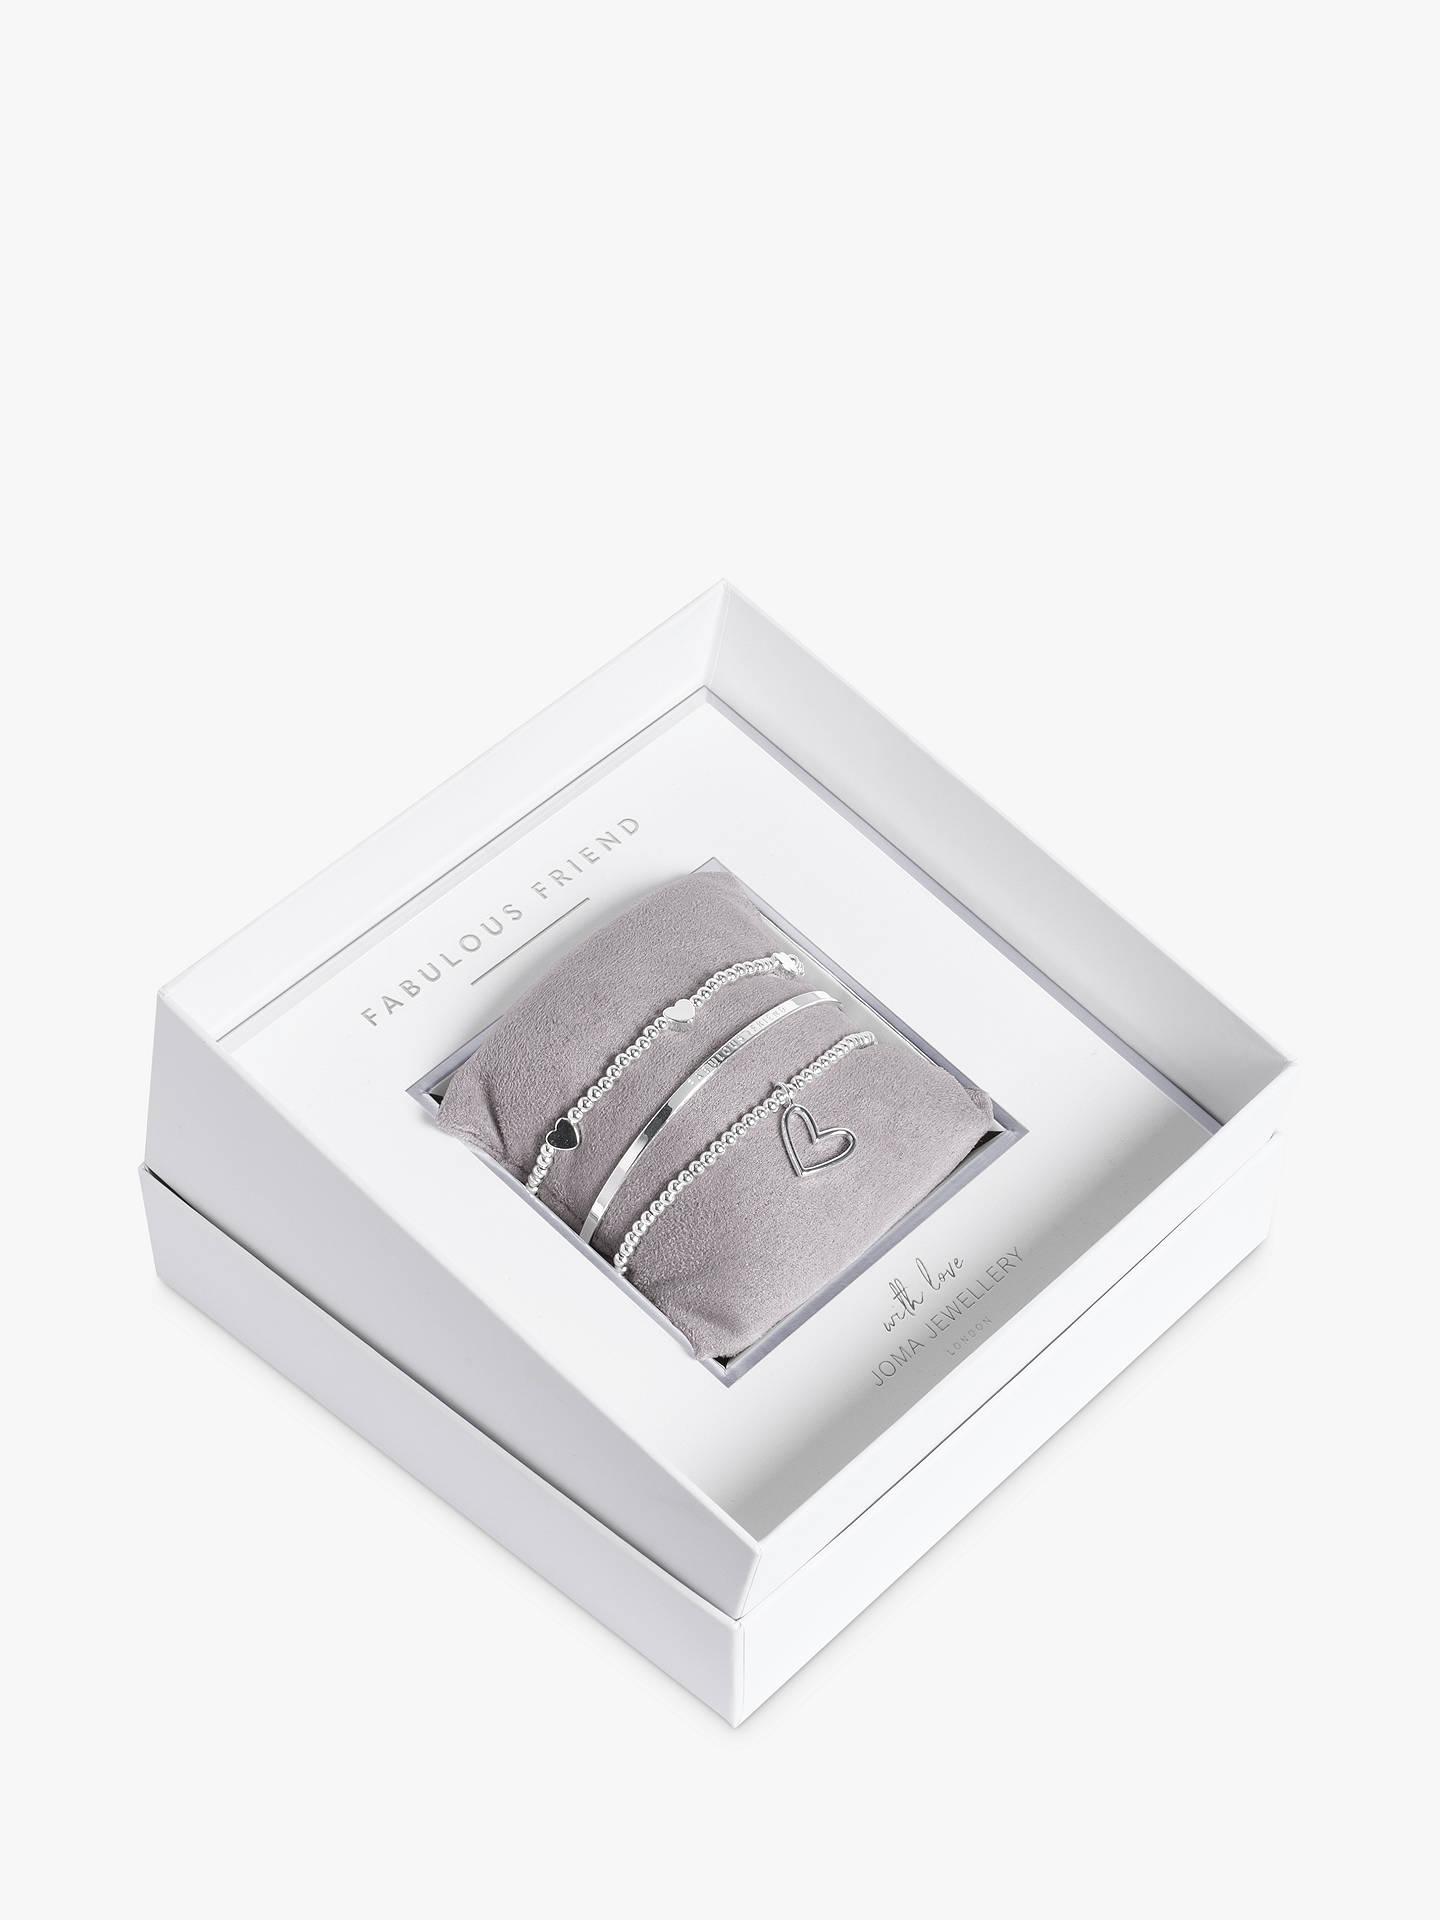 cbec3d45e4 Buy Joma Jewellery Fabulous Friend Bead and Heart Stretch Bracelets and  Bangle Gift Box Set,